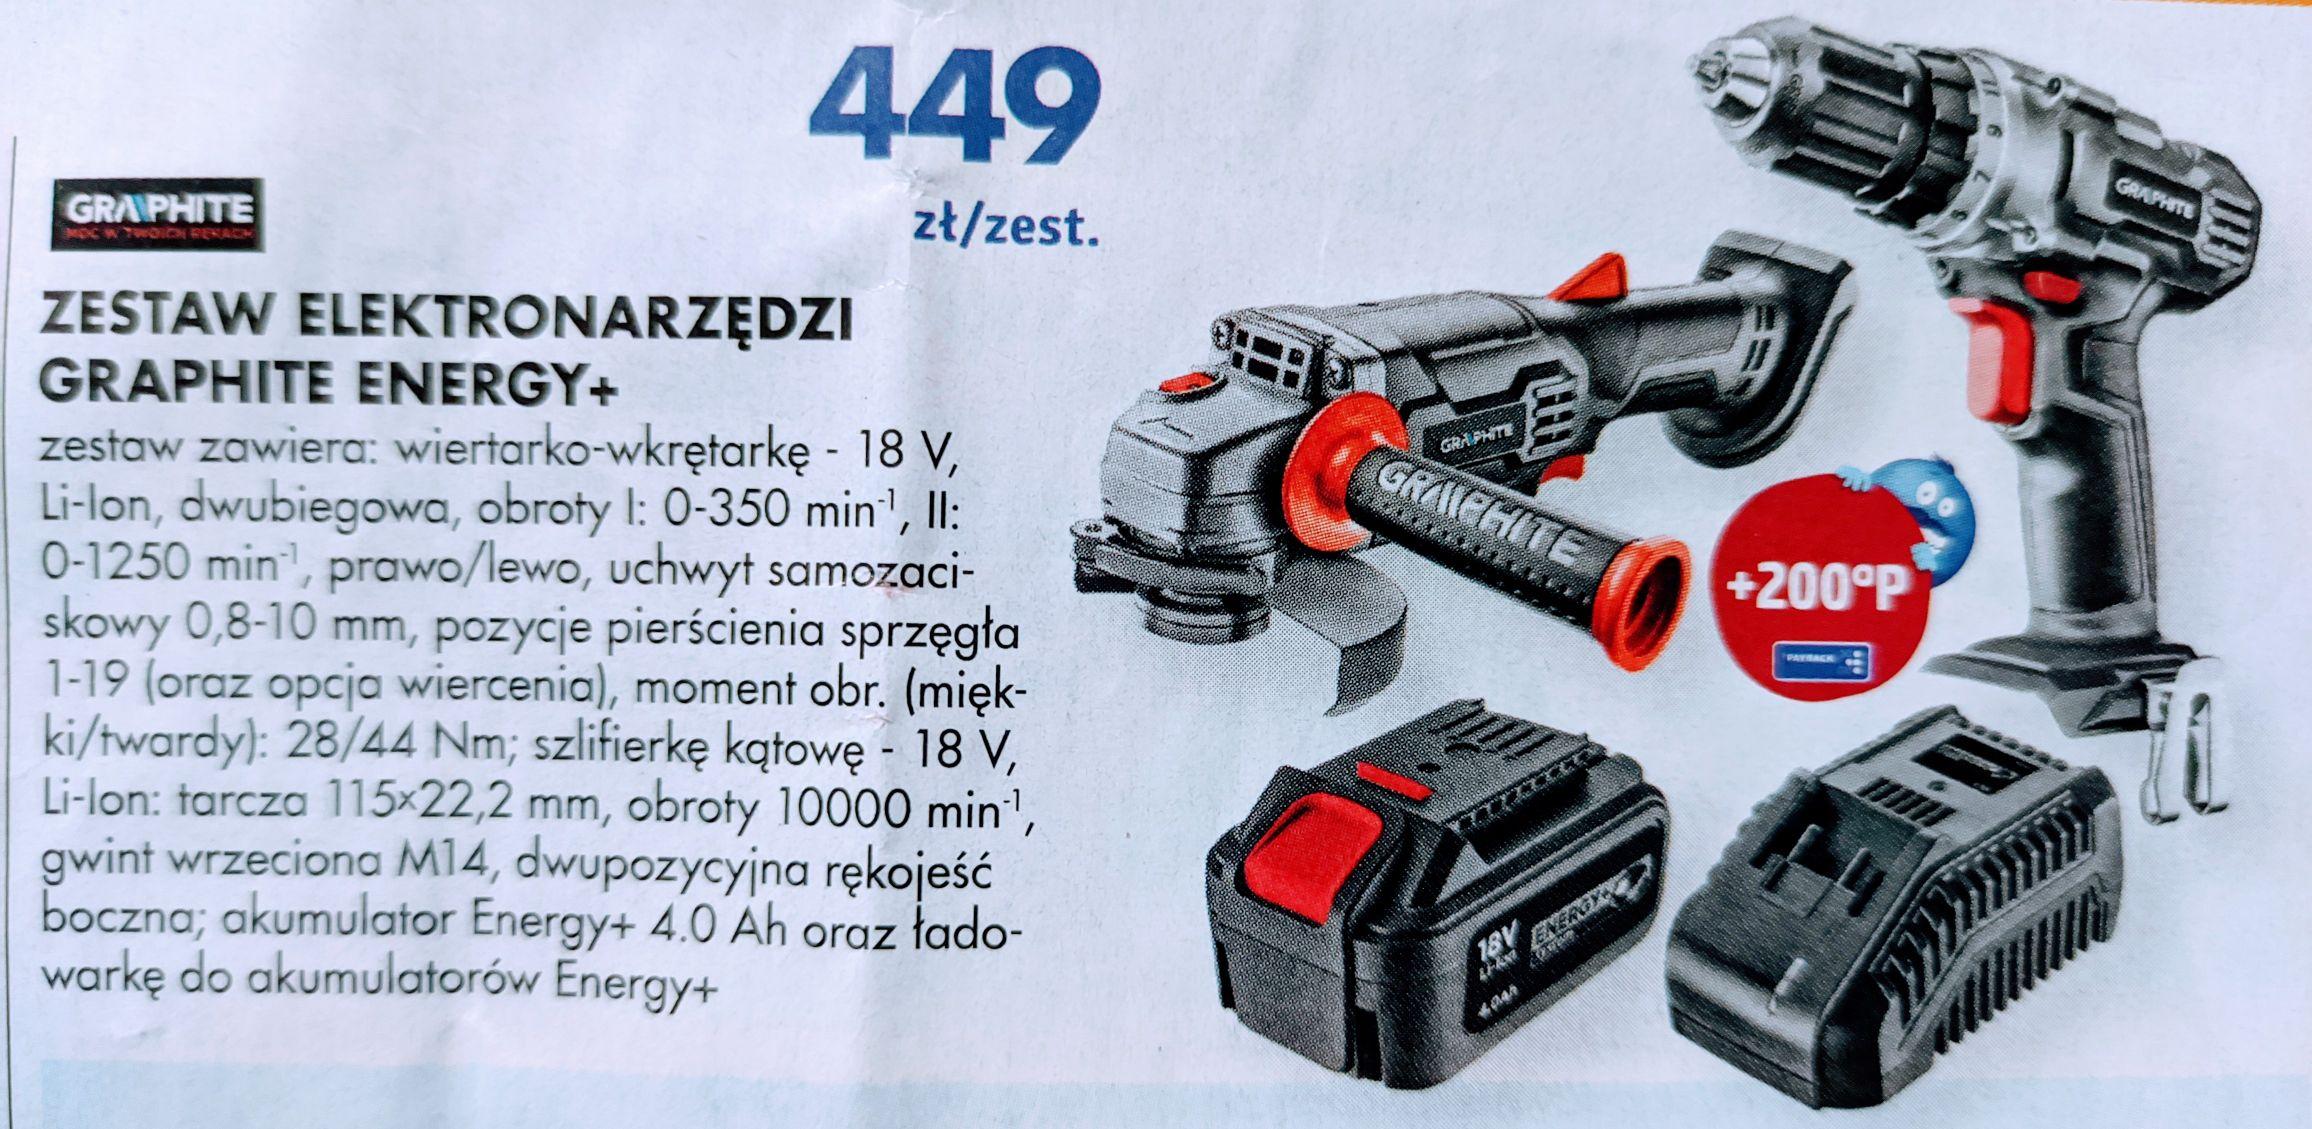 Zestaw Graphite wkrętarka + szlifierka + akumulator 4ah + ładowarka (Mrówka)